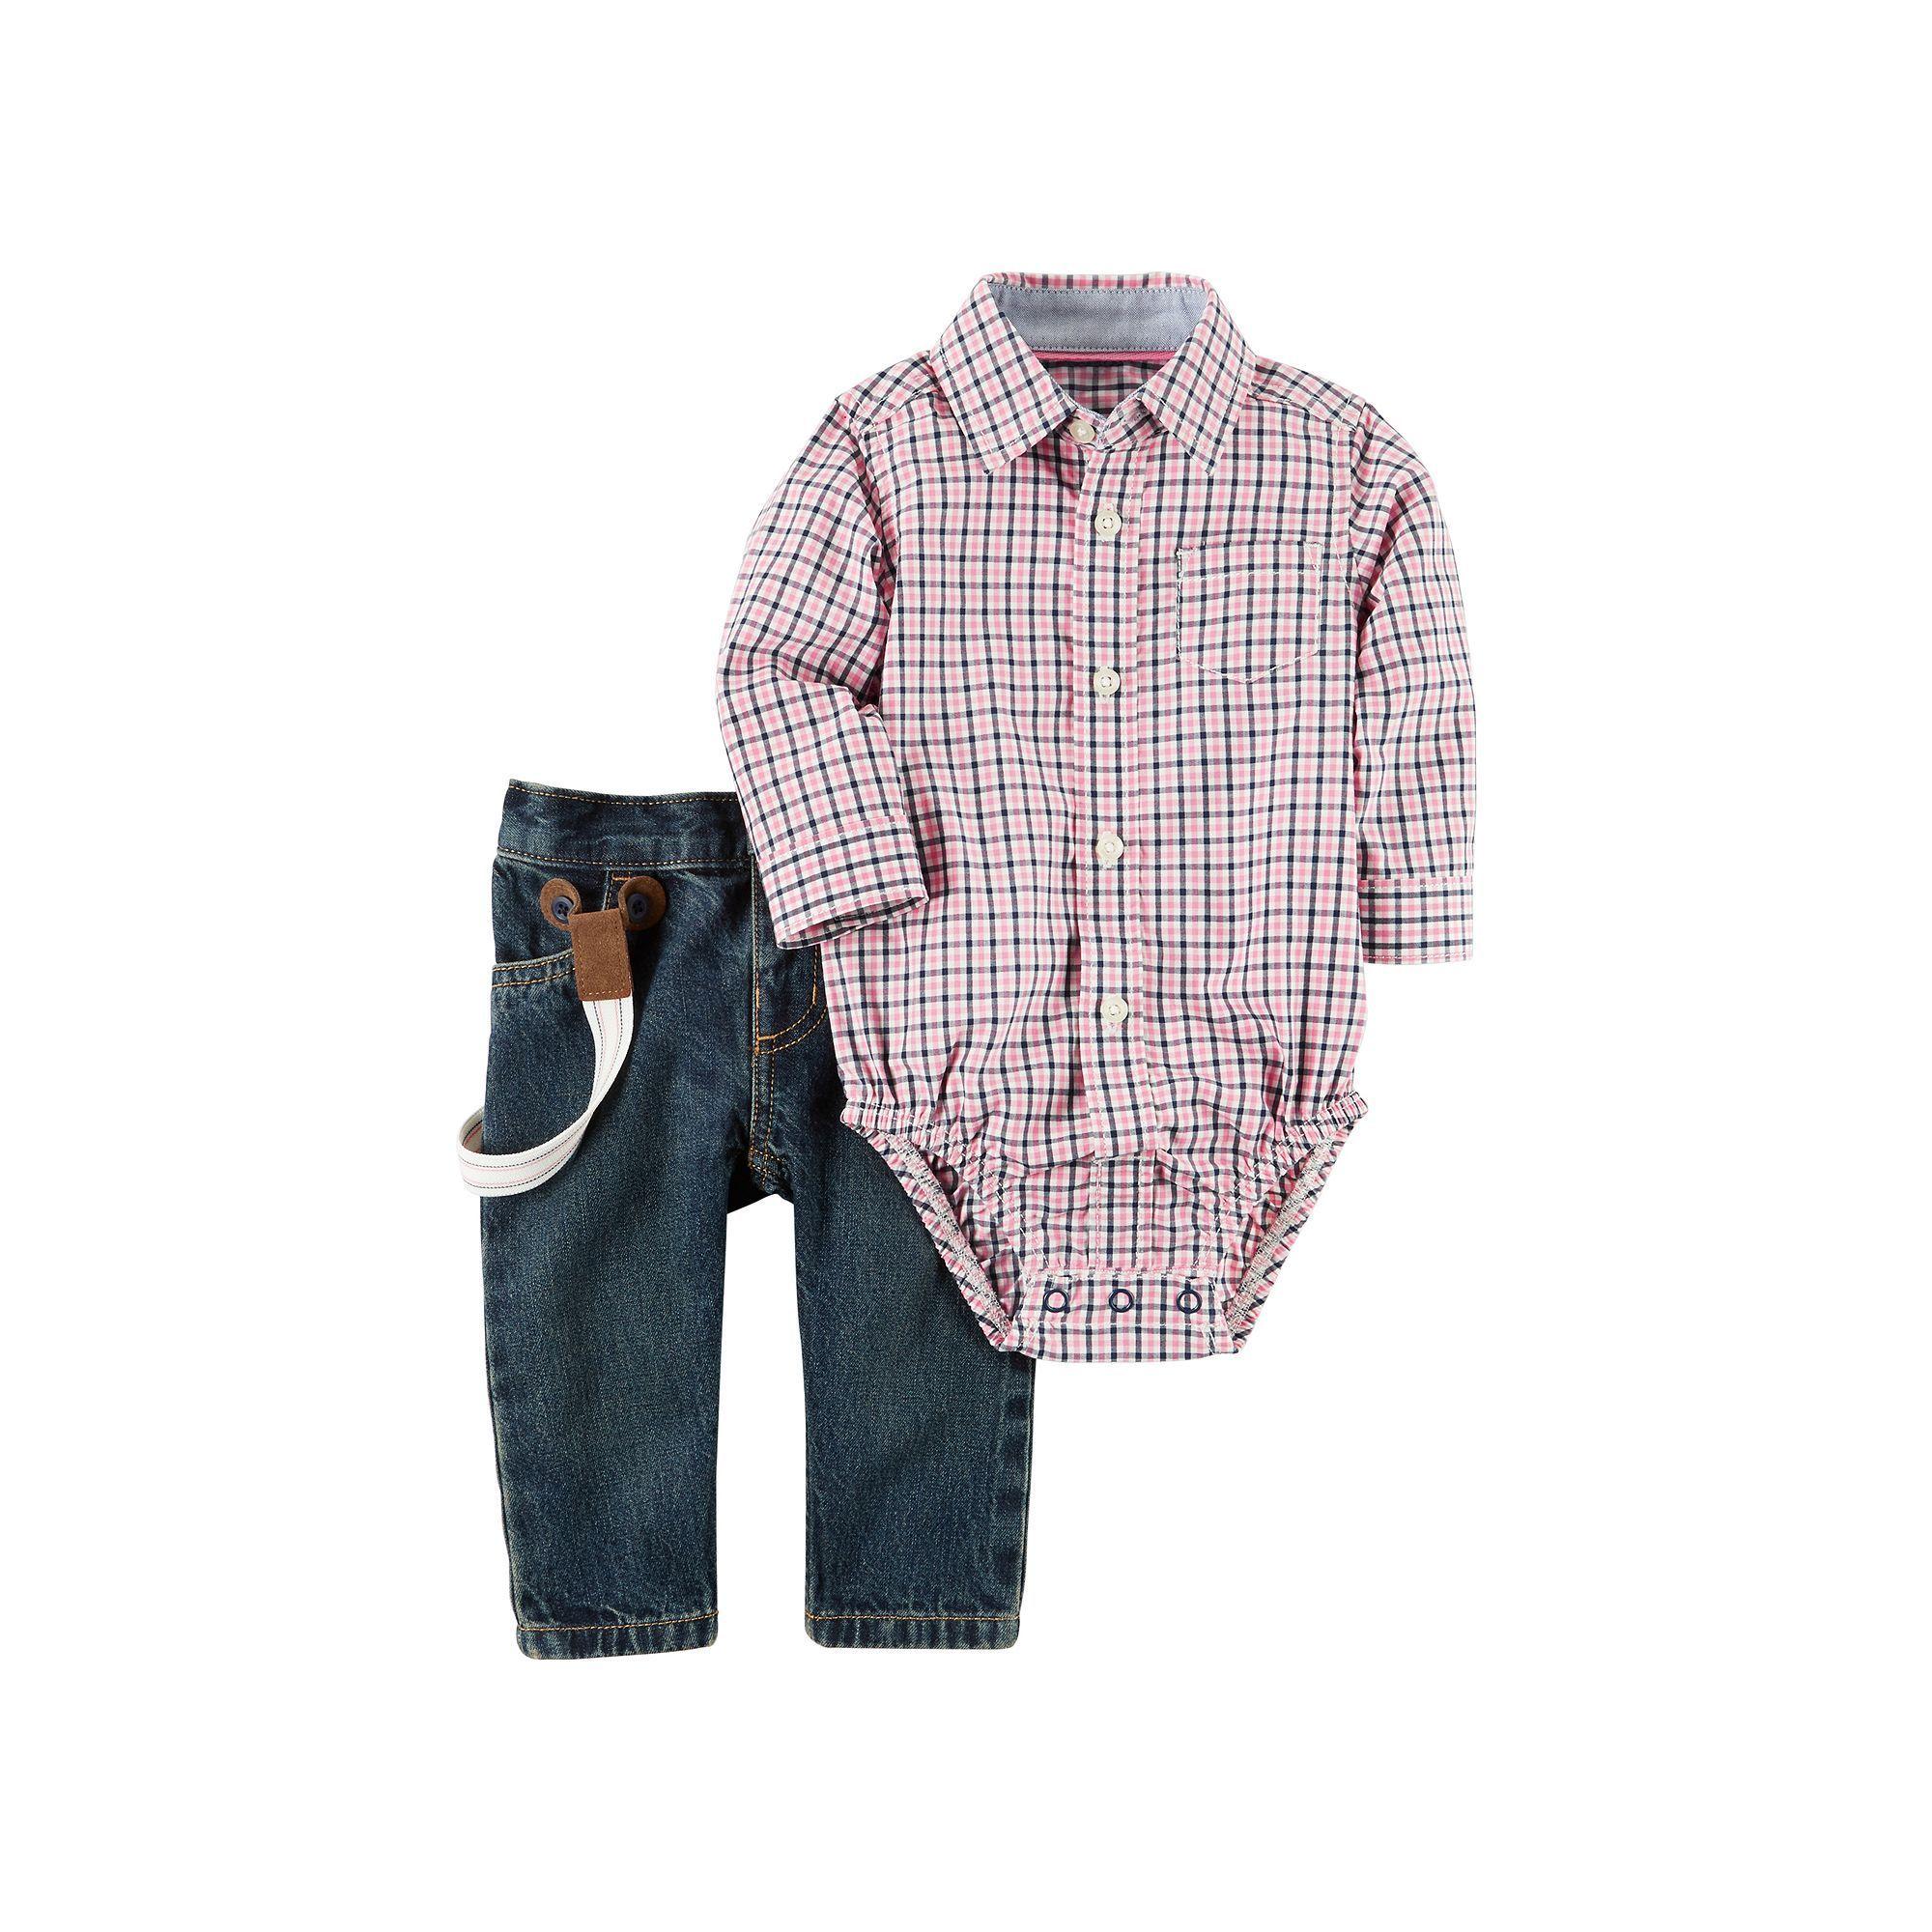 Carters Suspender Denim Jeans Boys 24 Months Blue